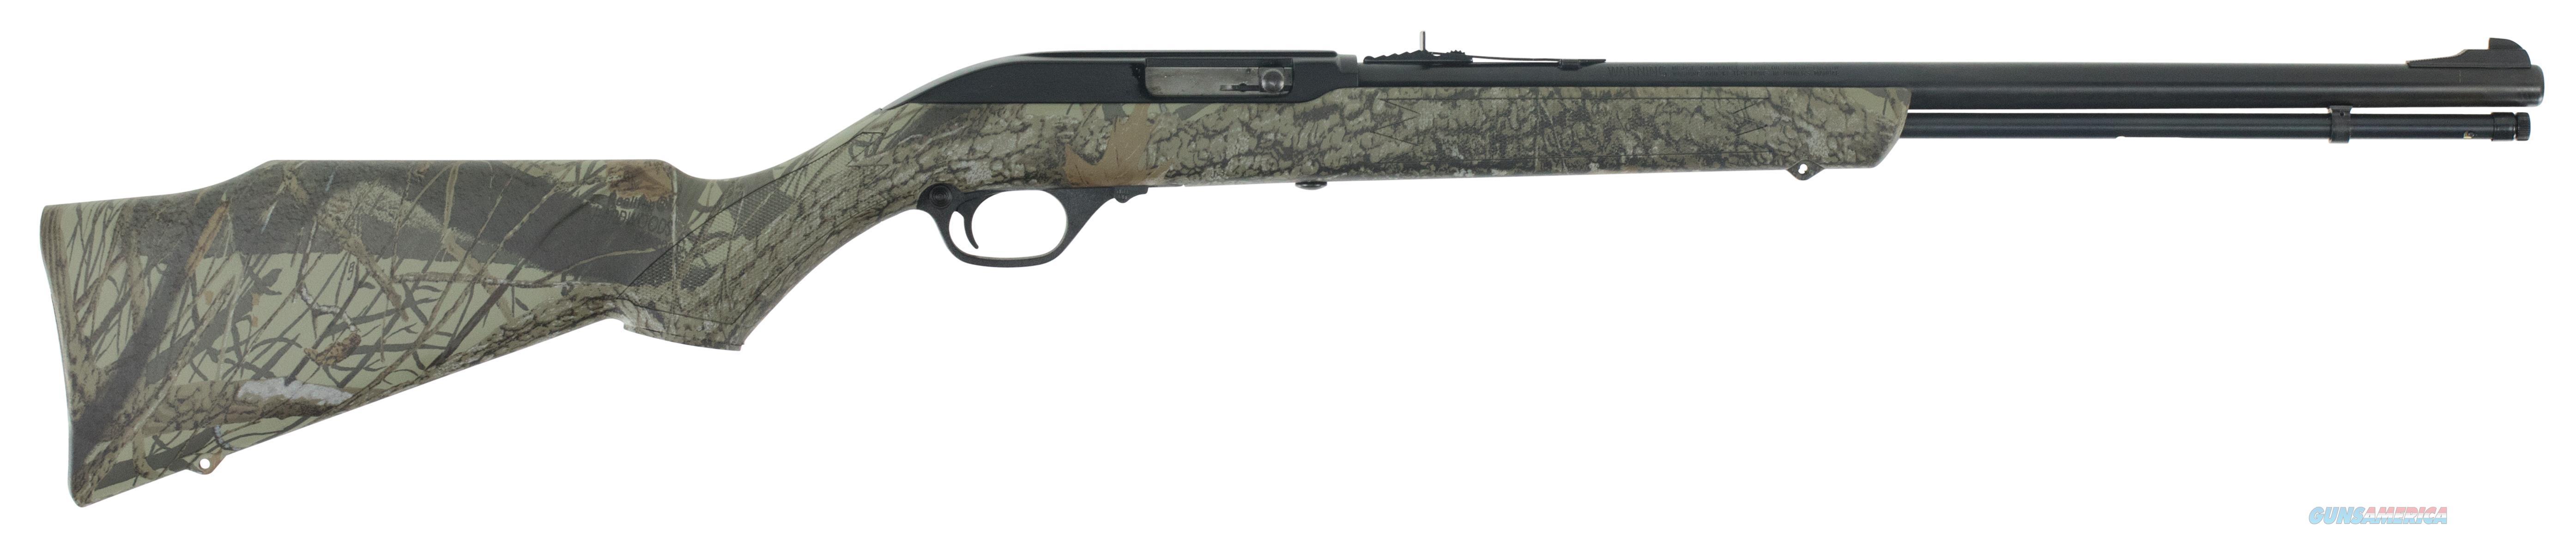 "Marlin 70624 60C Semi-Automatic 22 Long Rifle (Lr) 19"" 14+1 Synthetic Realtree Hardwoods Hd Stk Blued 70624  Guns > Rifles > MN Misc Rifles"